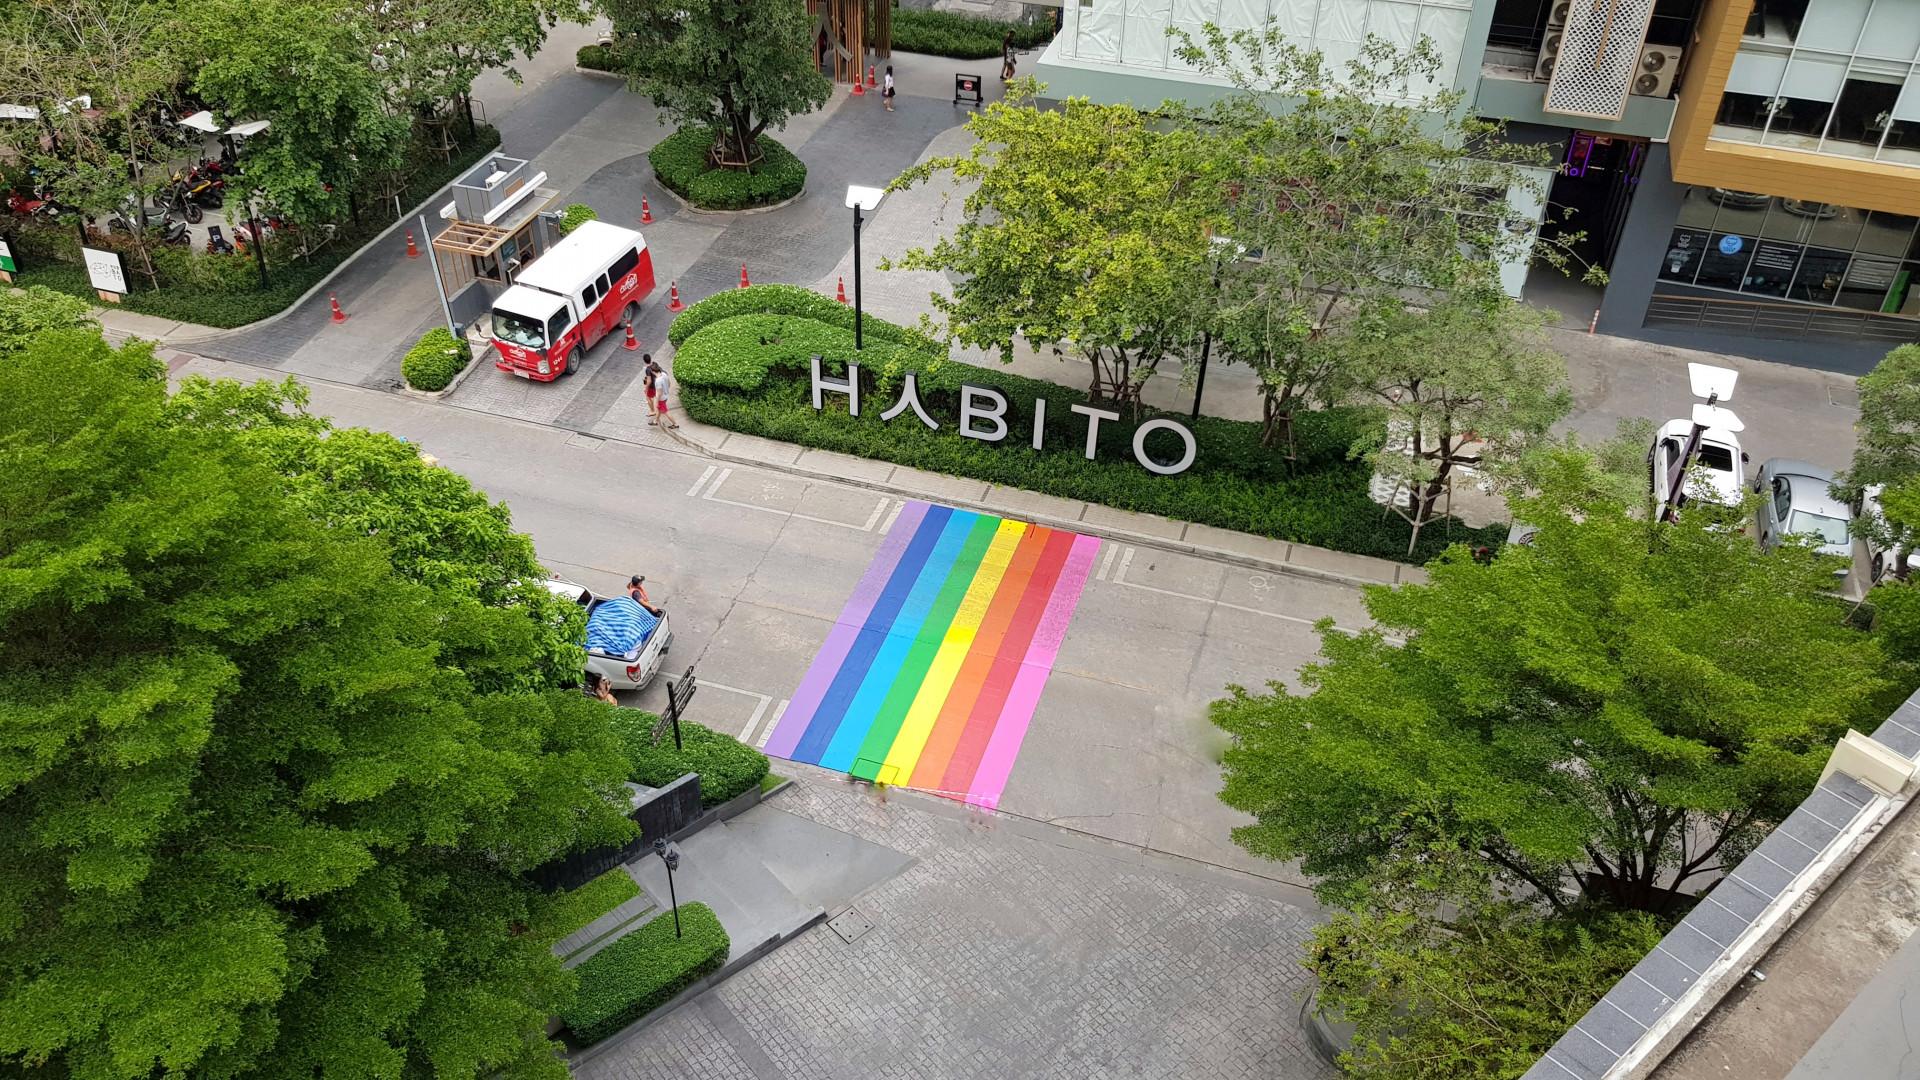 Sansiri Pride Month 2019 at Habito Mall